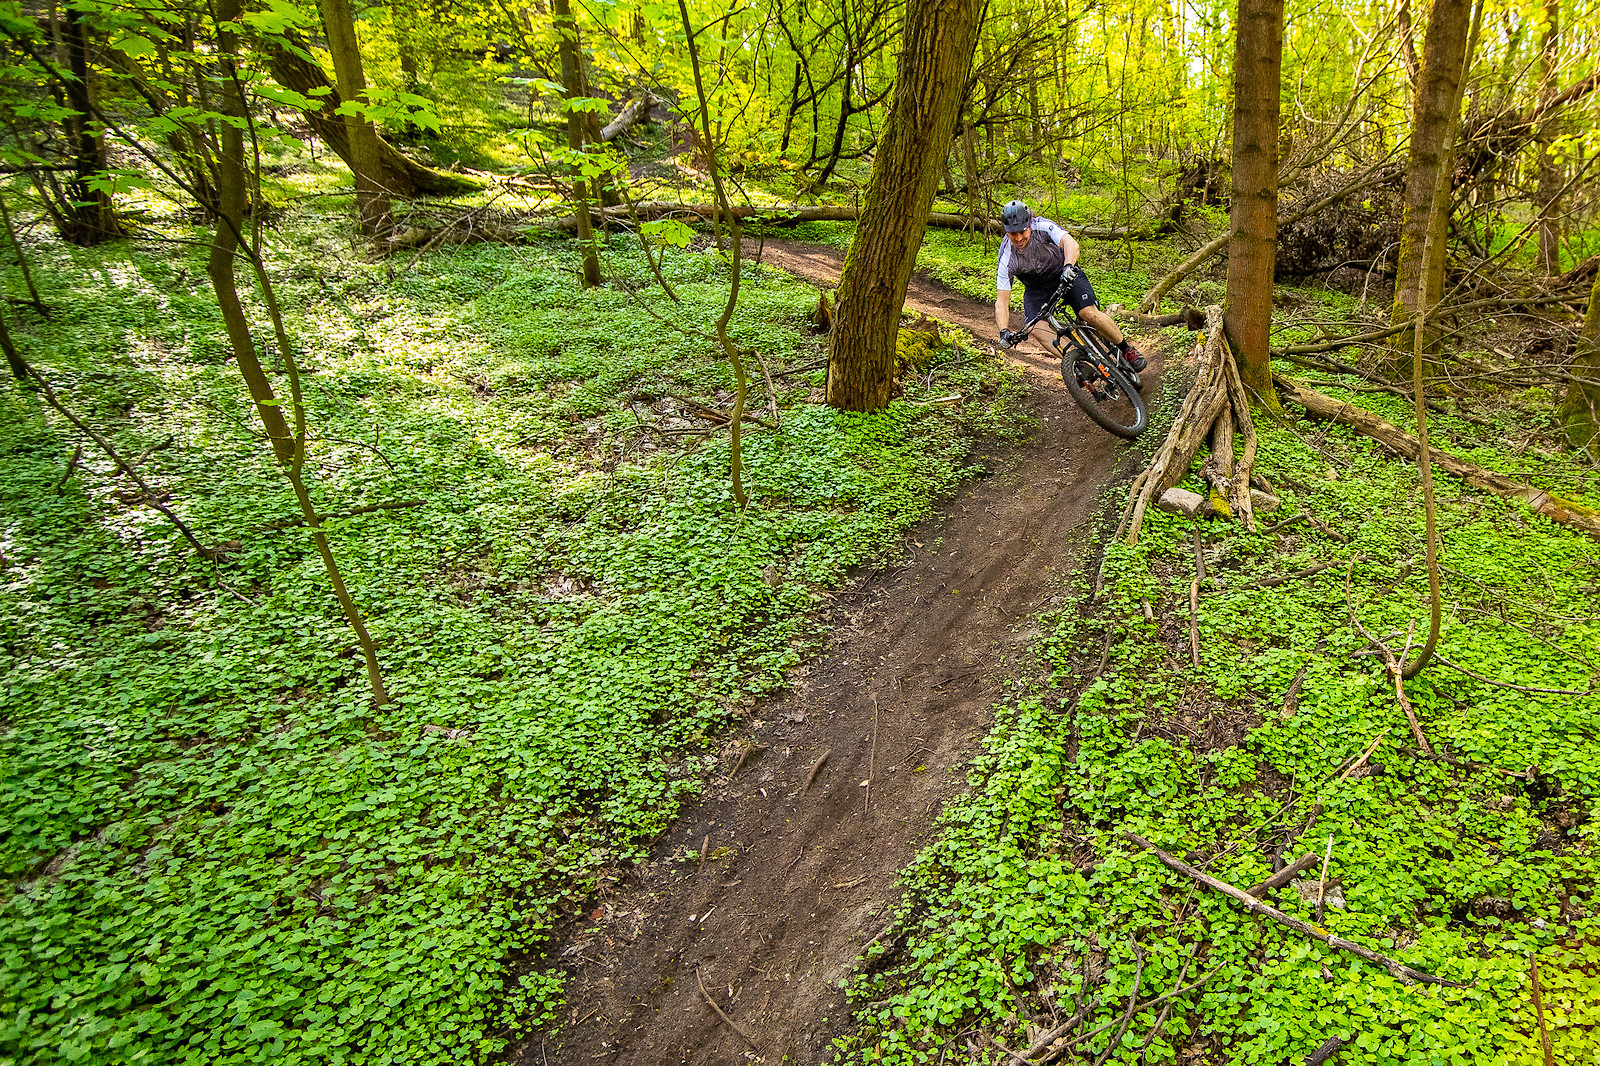 Through The Wild Garlic - Robert_Loughlin - Mountain Biking Pictures - Vital MTB